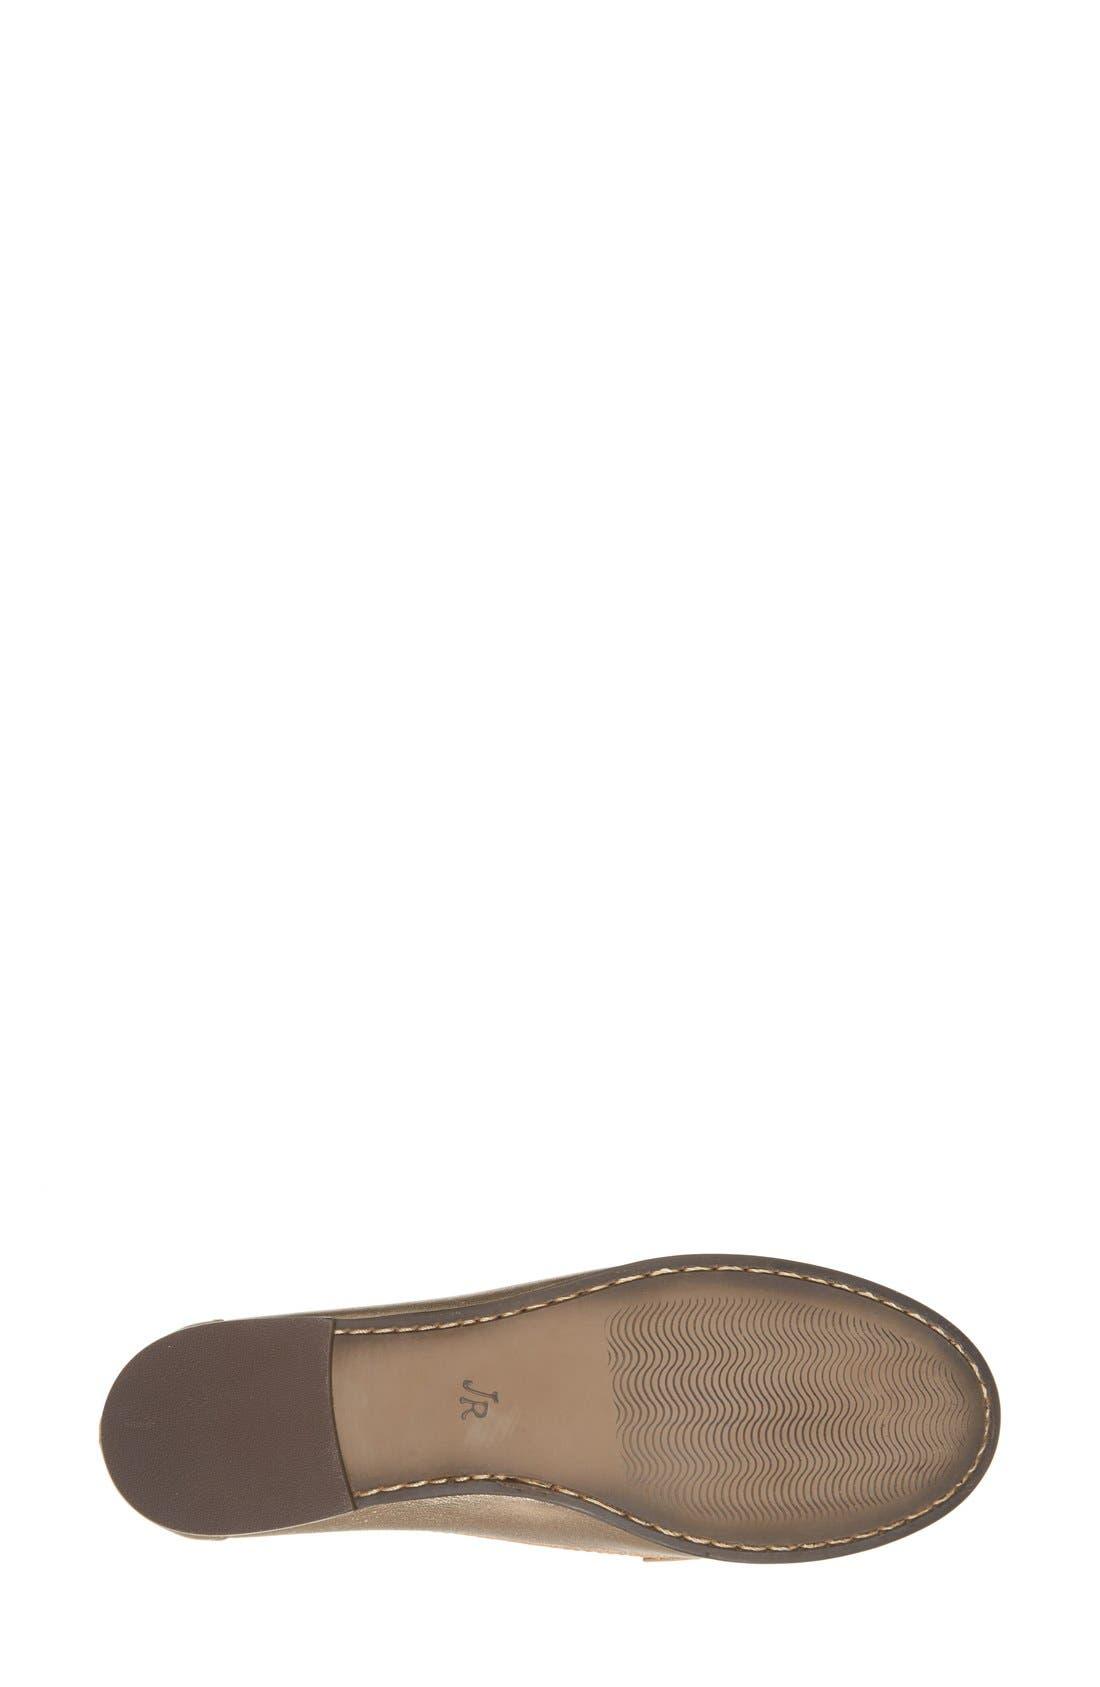 'Quinn' Leather Loafer,                             Alternate thumbnail 20, color,